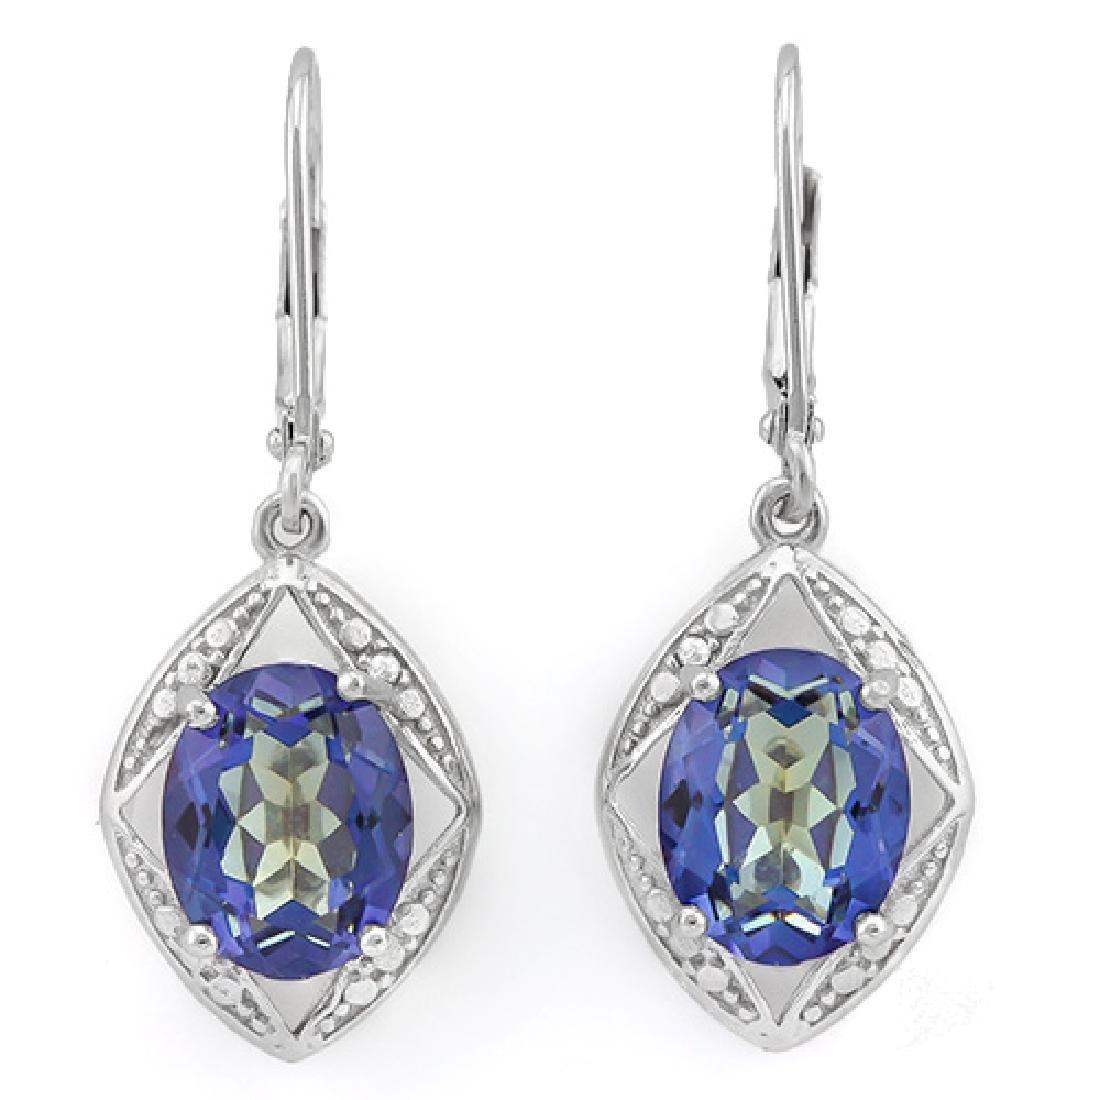 Blue Violet Mystic Topaz Dangle Earrings in Sterling